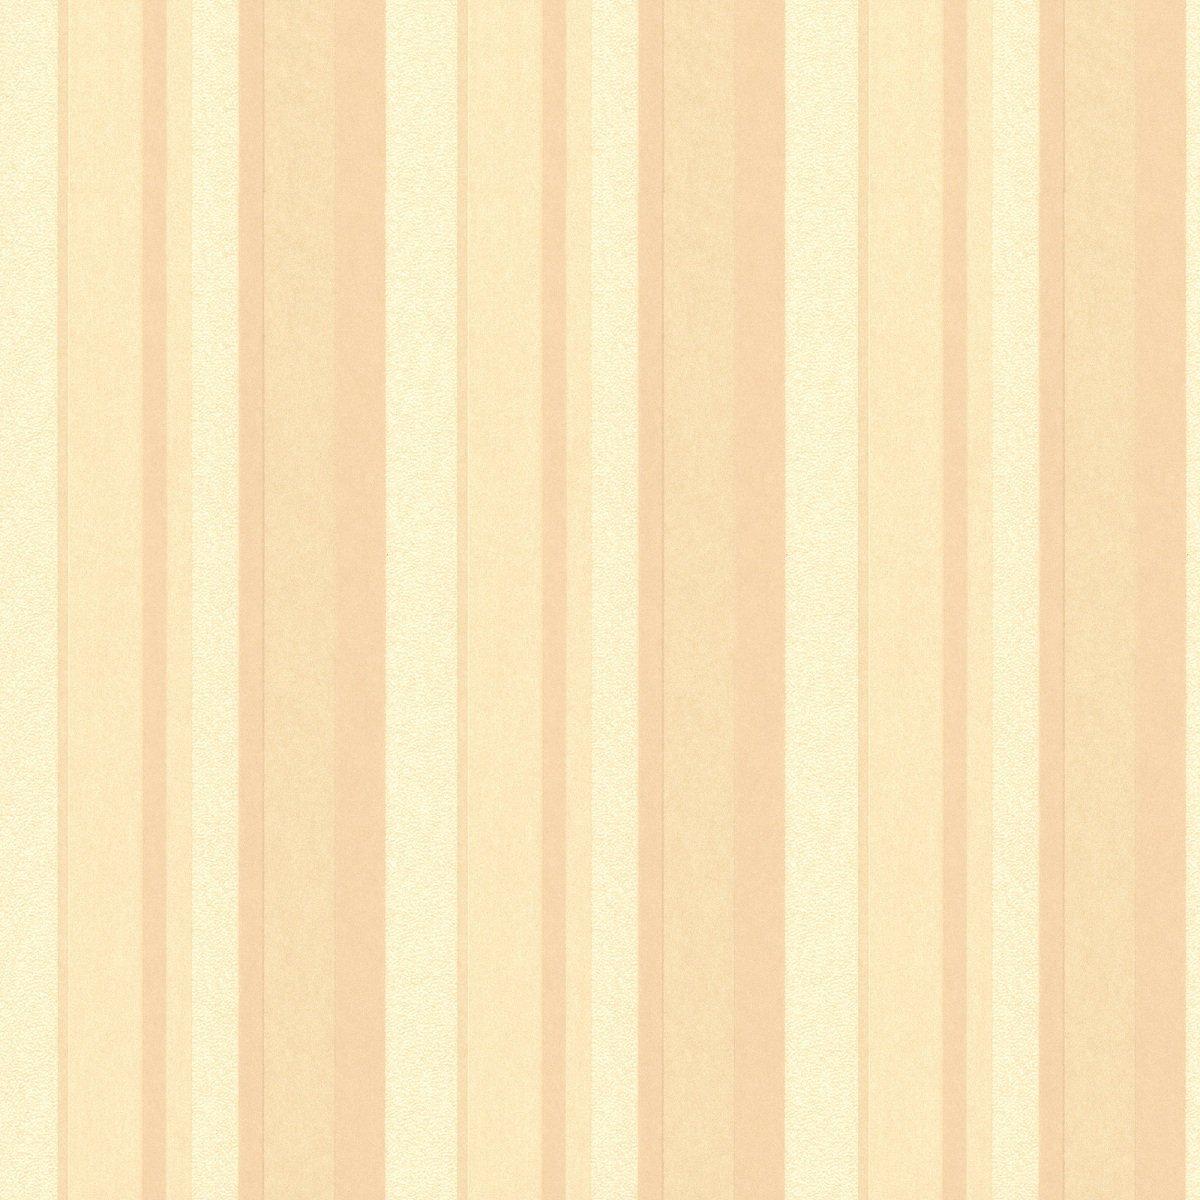 Обои Wallquest Vivaldi B03356/13, интернет магазин Волео